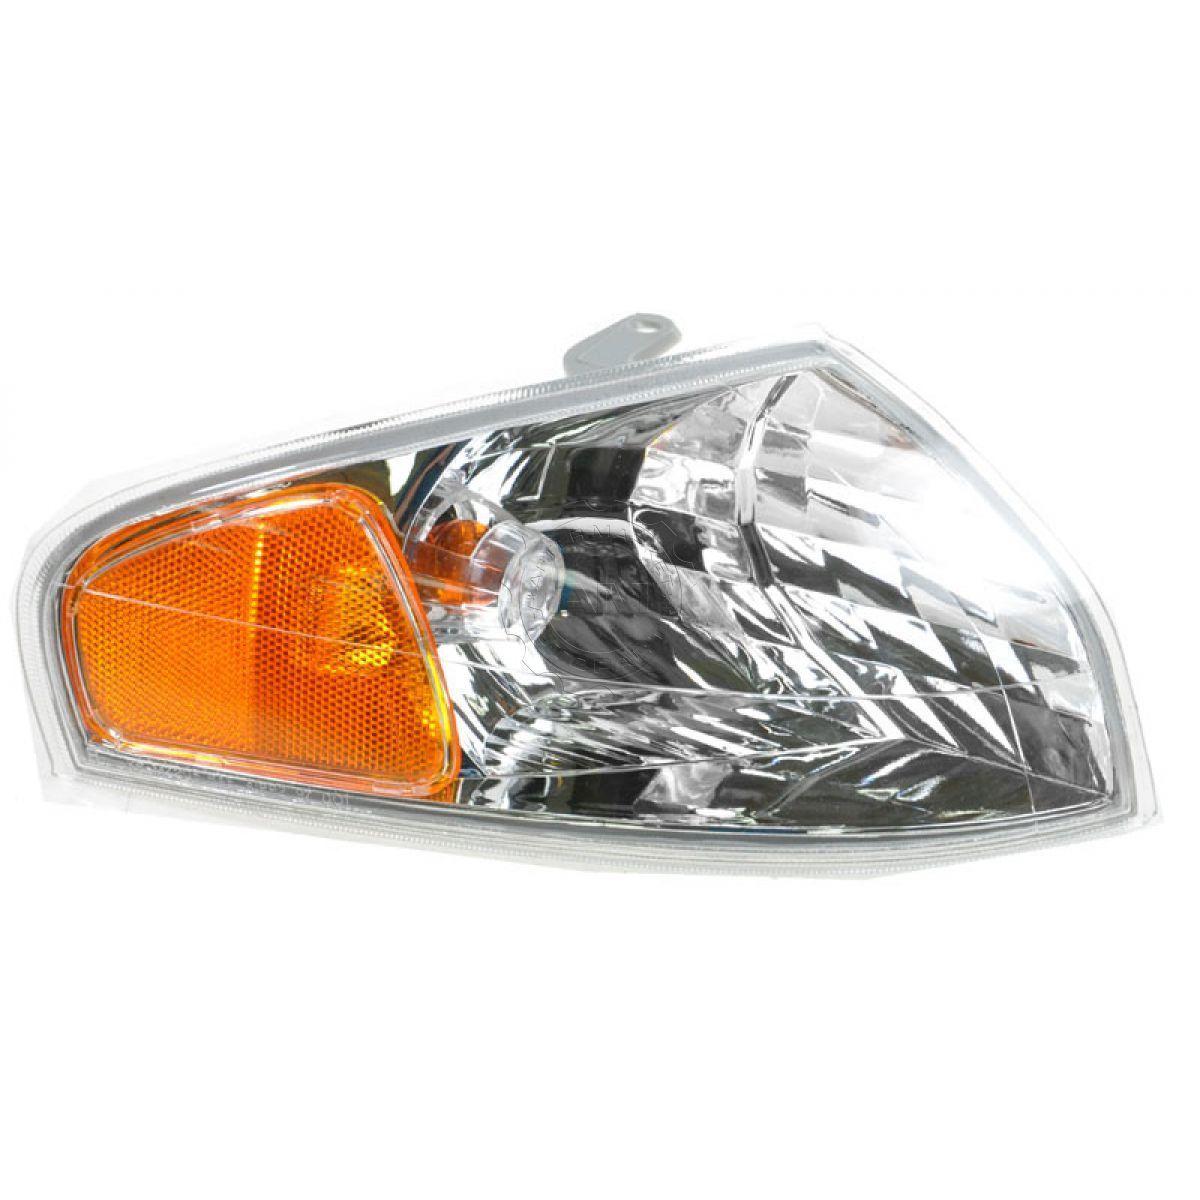 Corner Parking Marker Turn Signal Lamp Light RH Right Side for 92-93 Accord